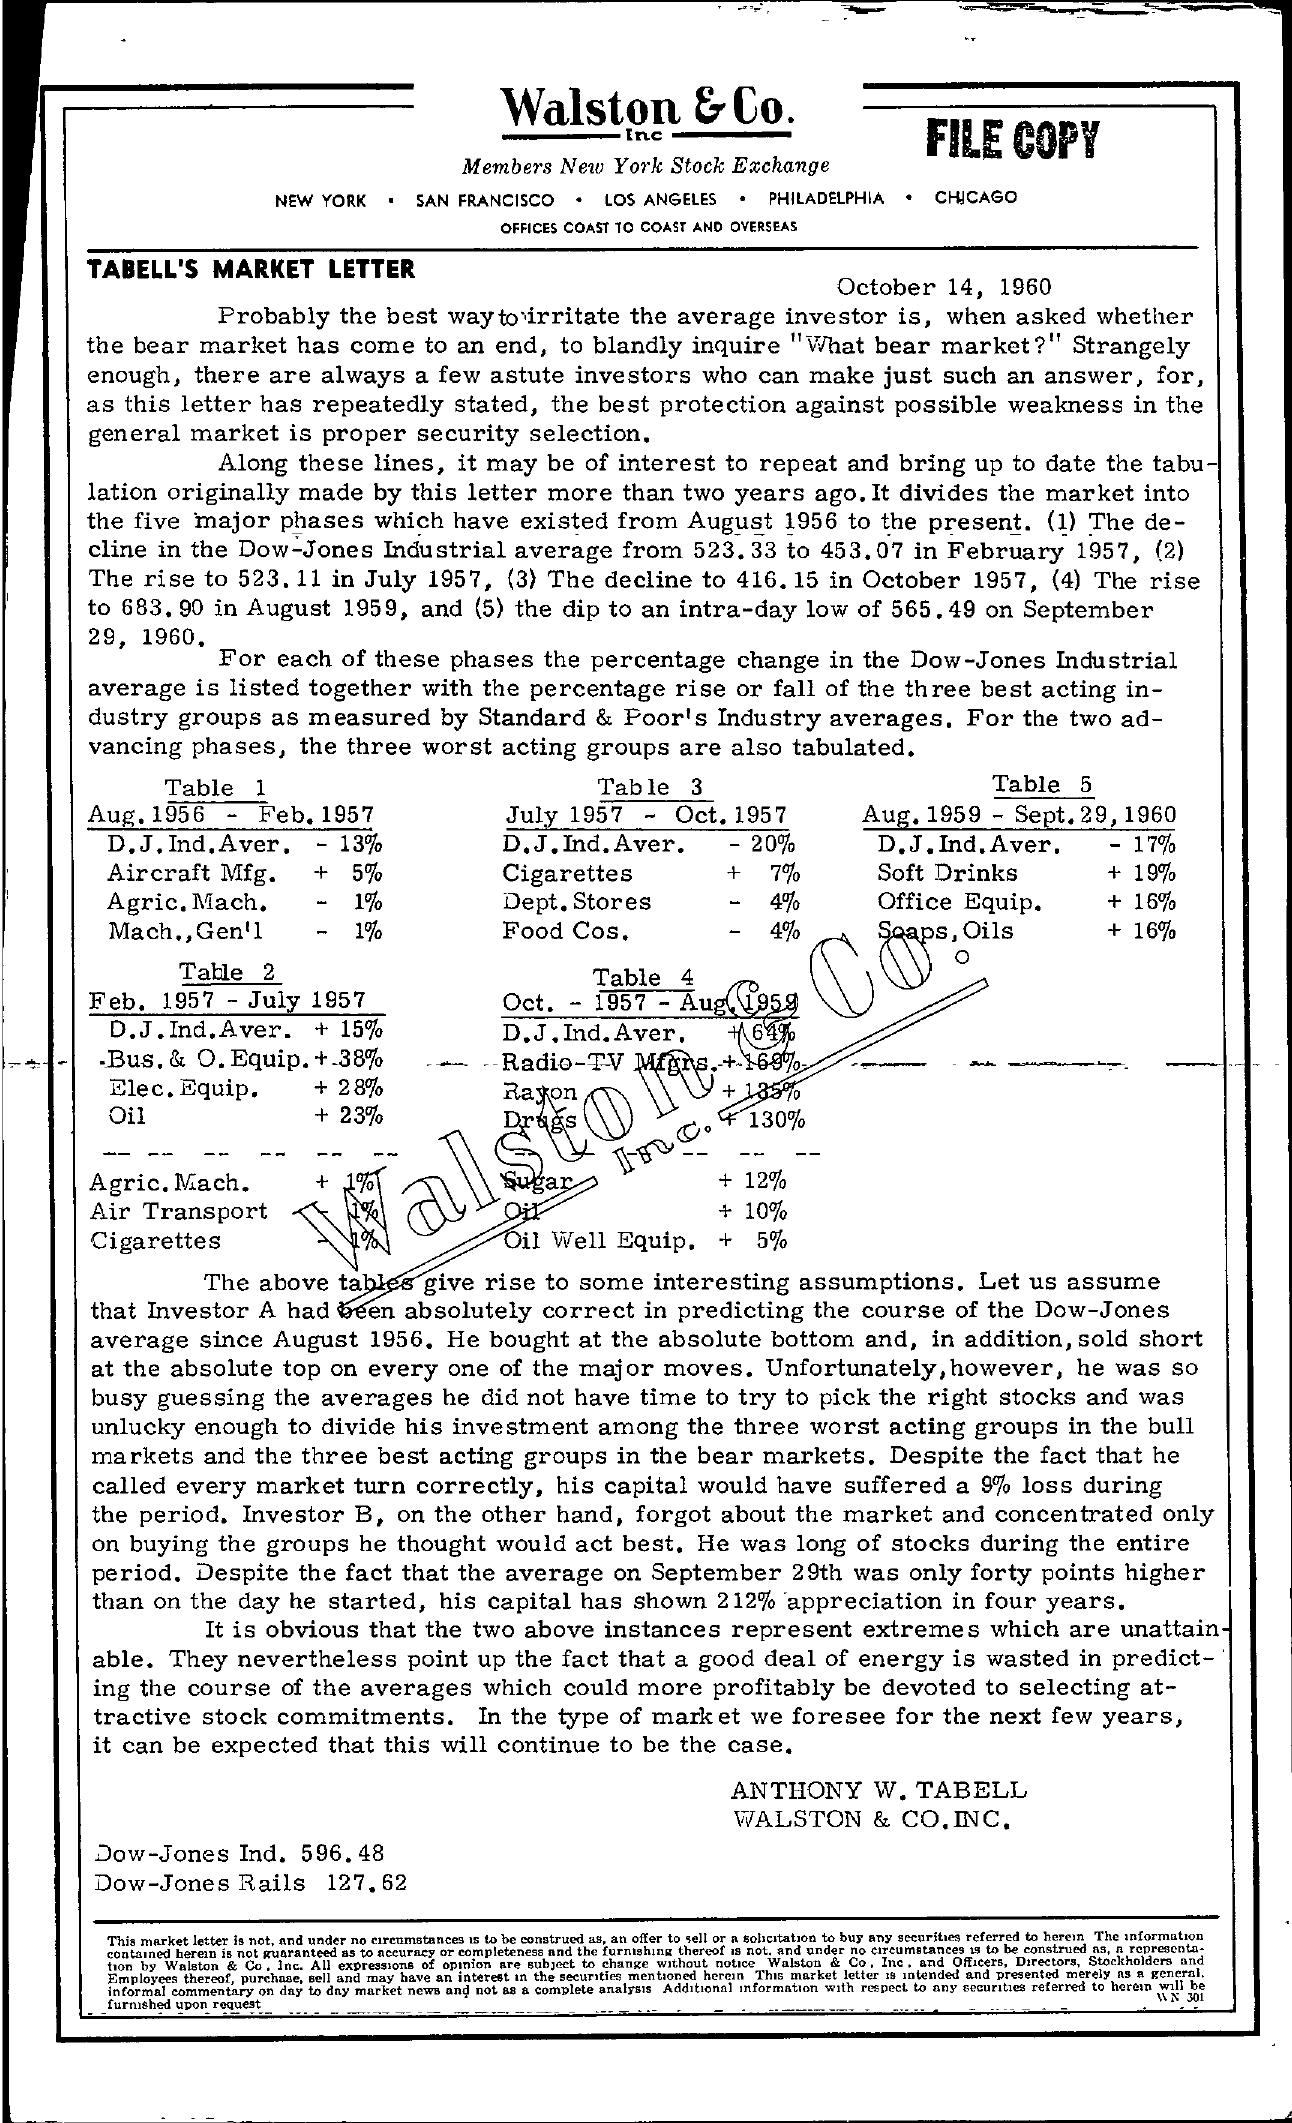 Tabell's Market Letter - October 14, 1960